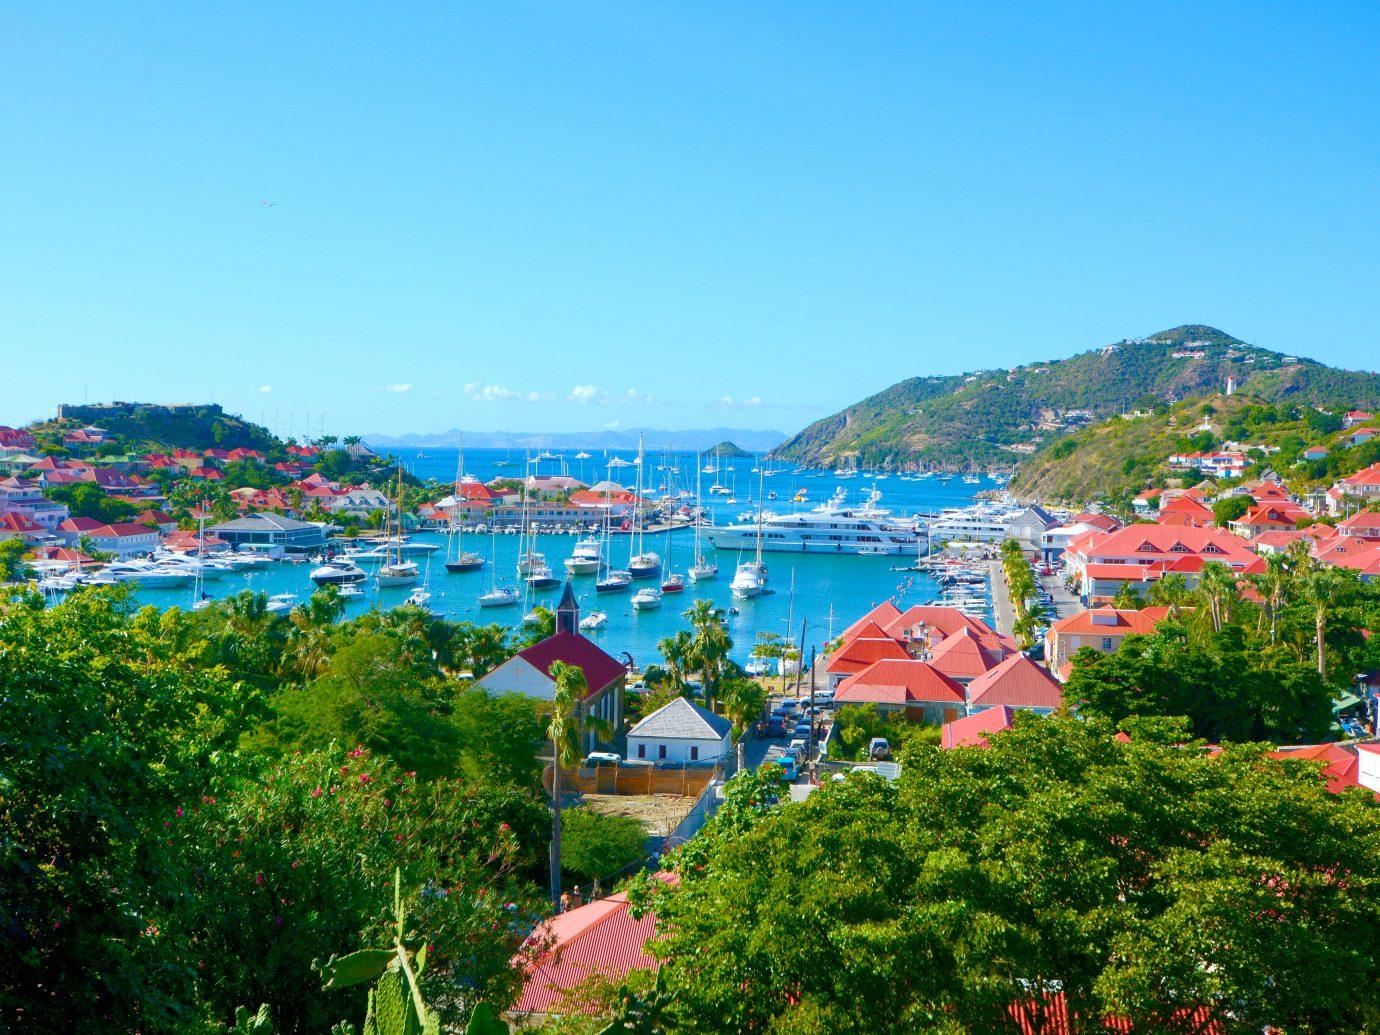 St Barths island, Caribbean sea